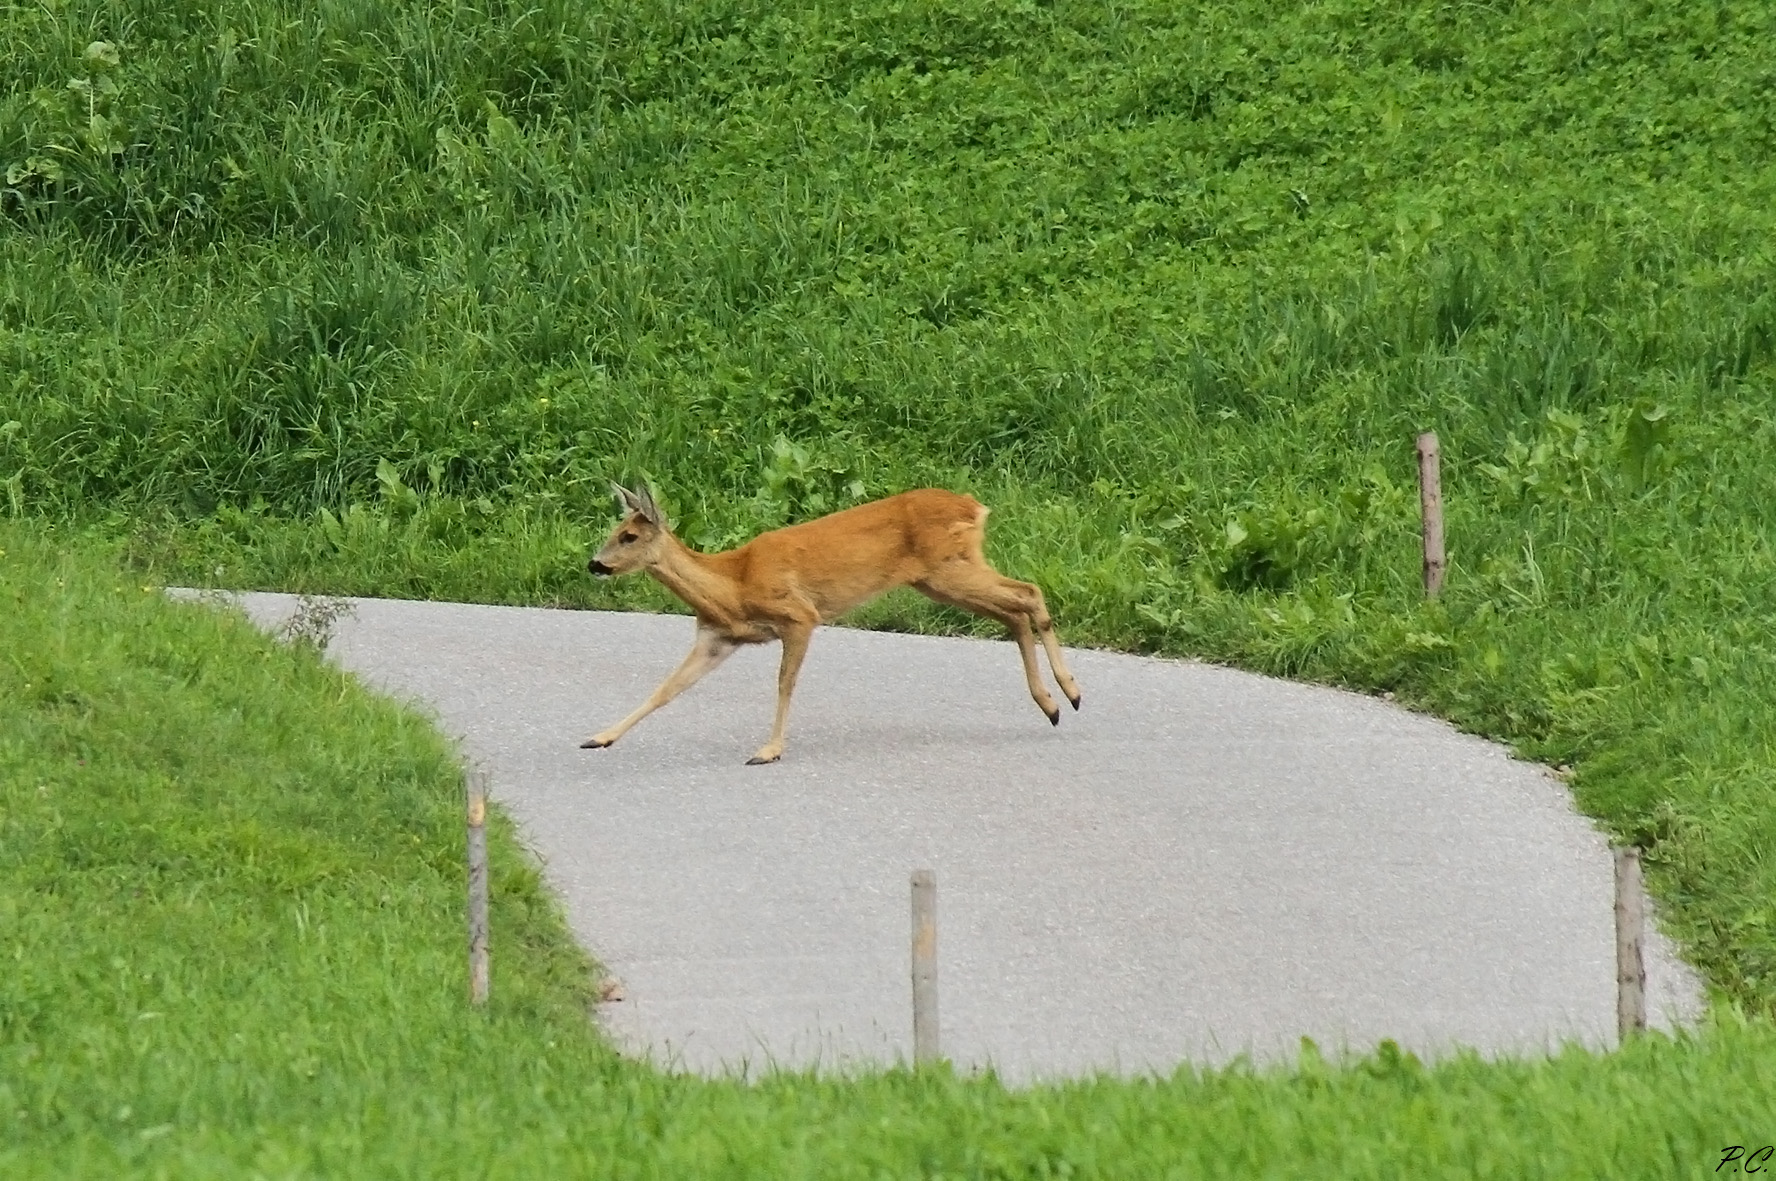 Careful crossing wild animals...